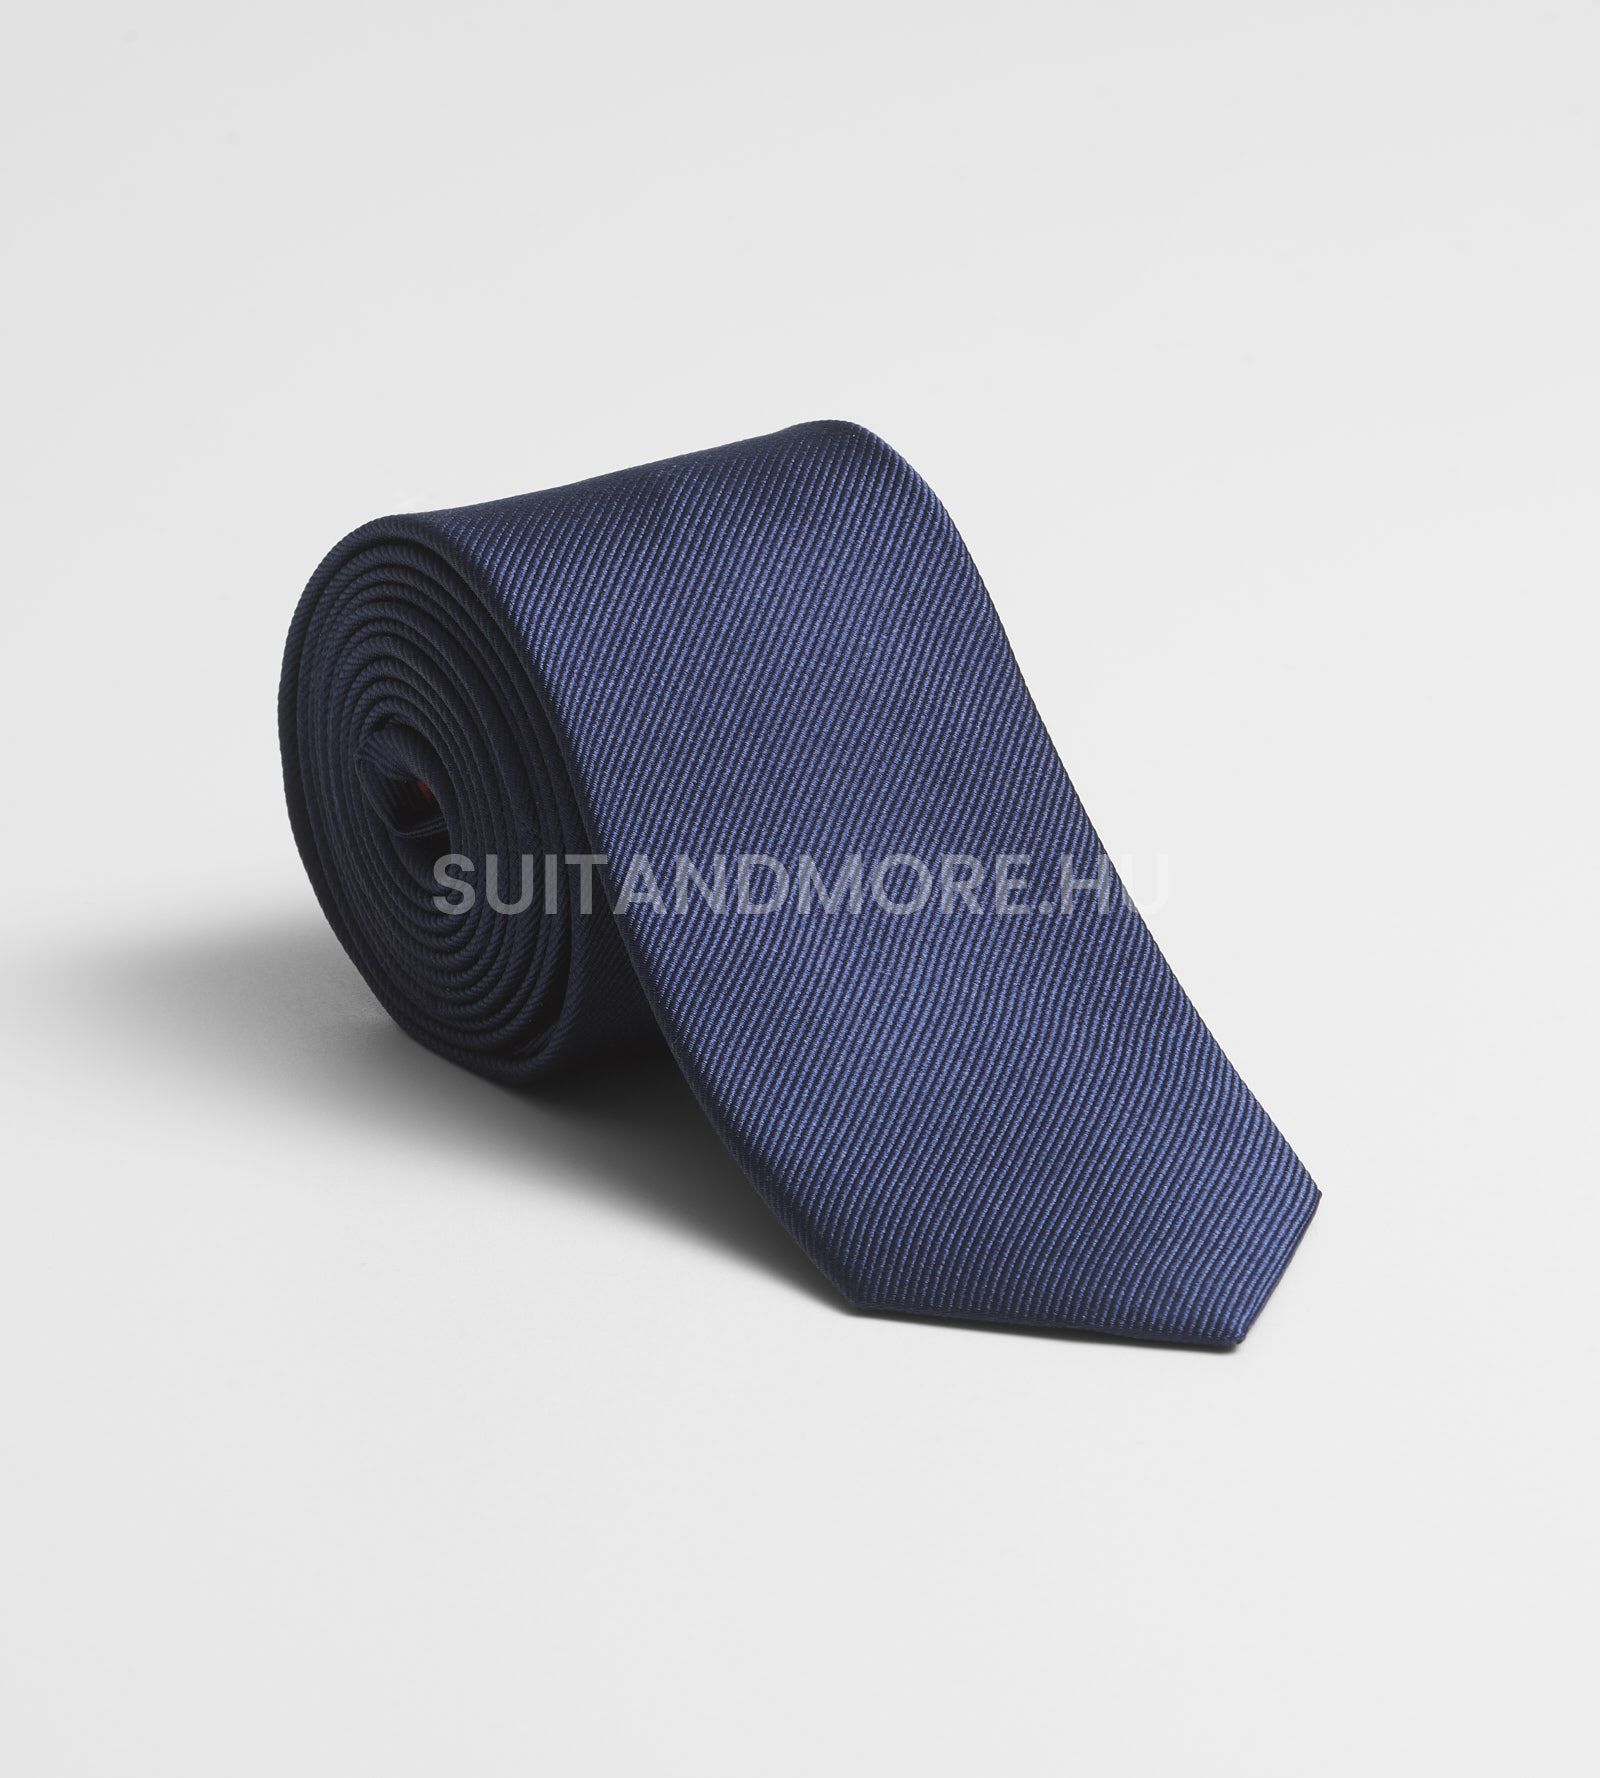 olymp-sotetkek-strukturalt-selyem-nyakkendo-7696-00-15-02